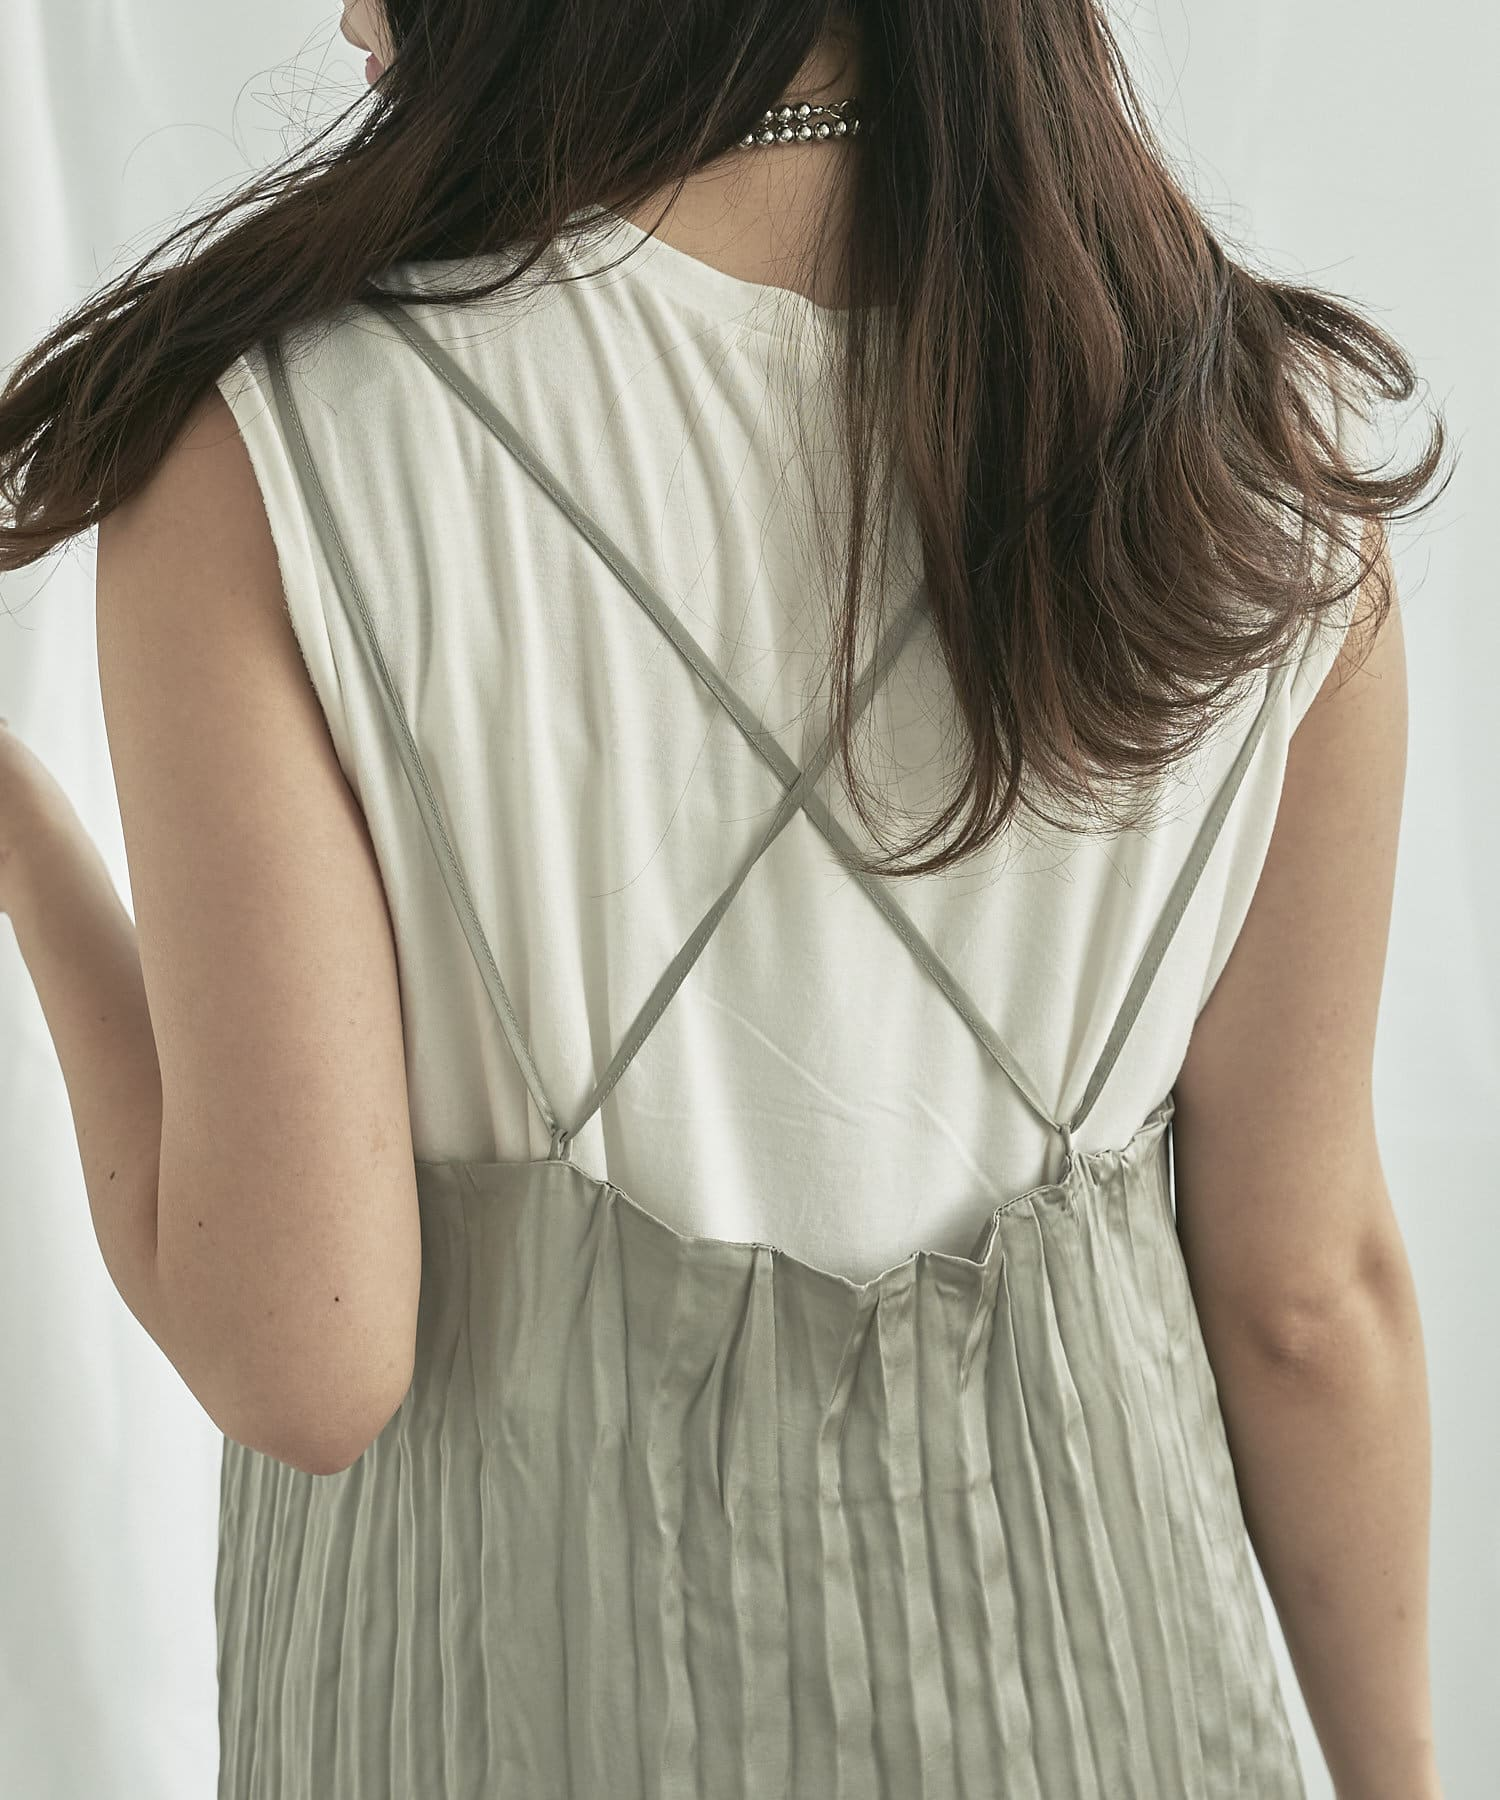 mona Belinda(モナ ベリンダ) 【着用動画あり】配色プリーツキャミワンピース